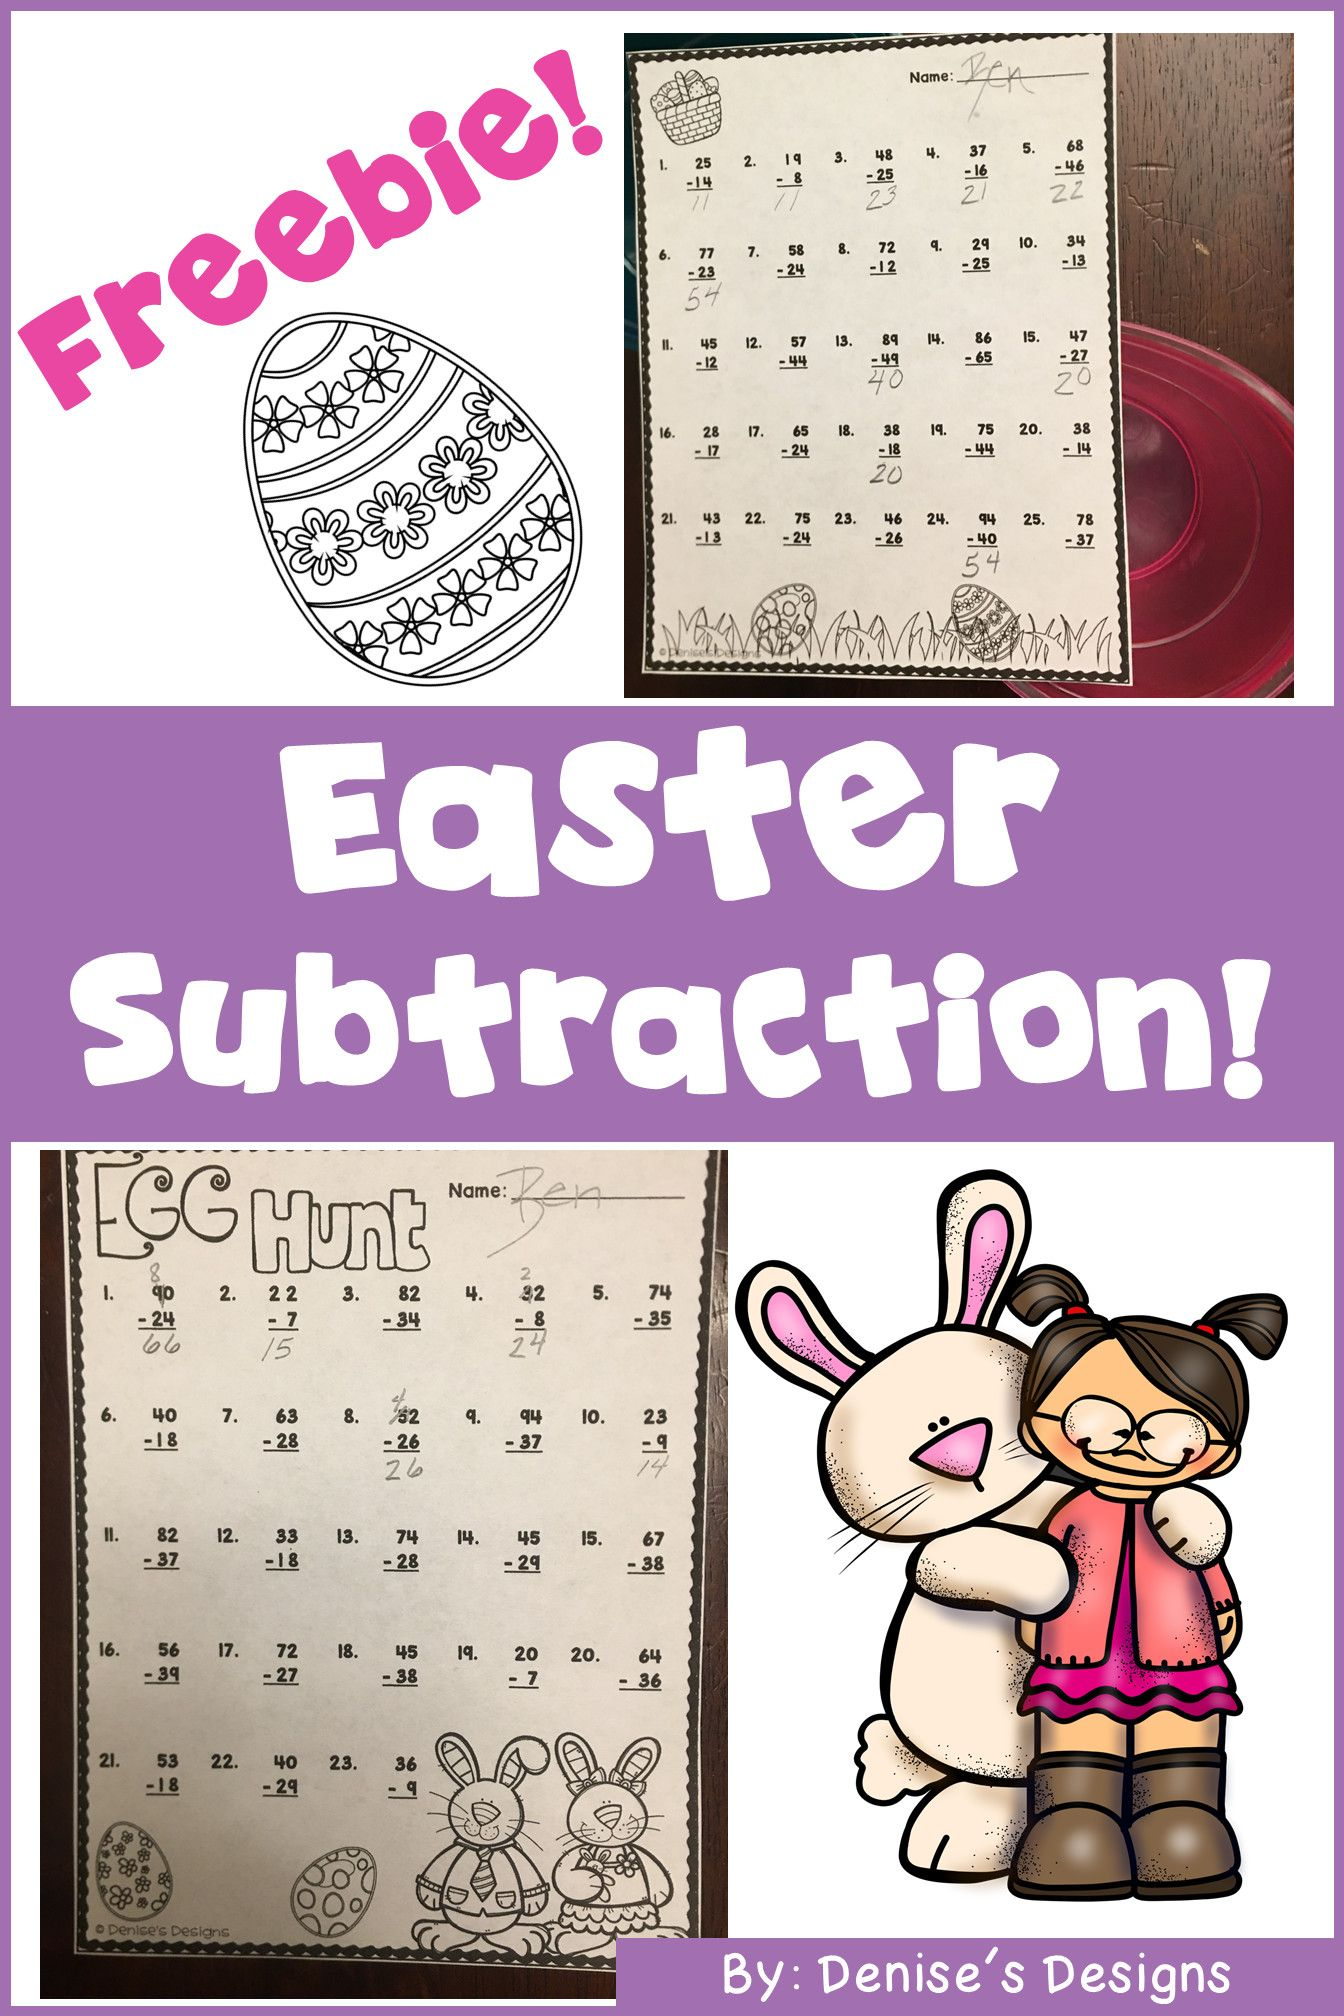 2 Easter Subtraction Worksheet Printable In